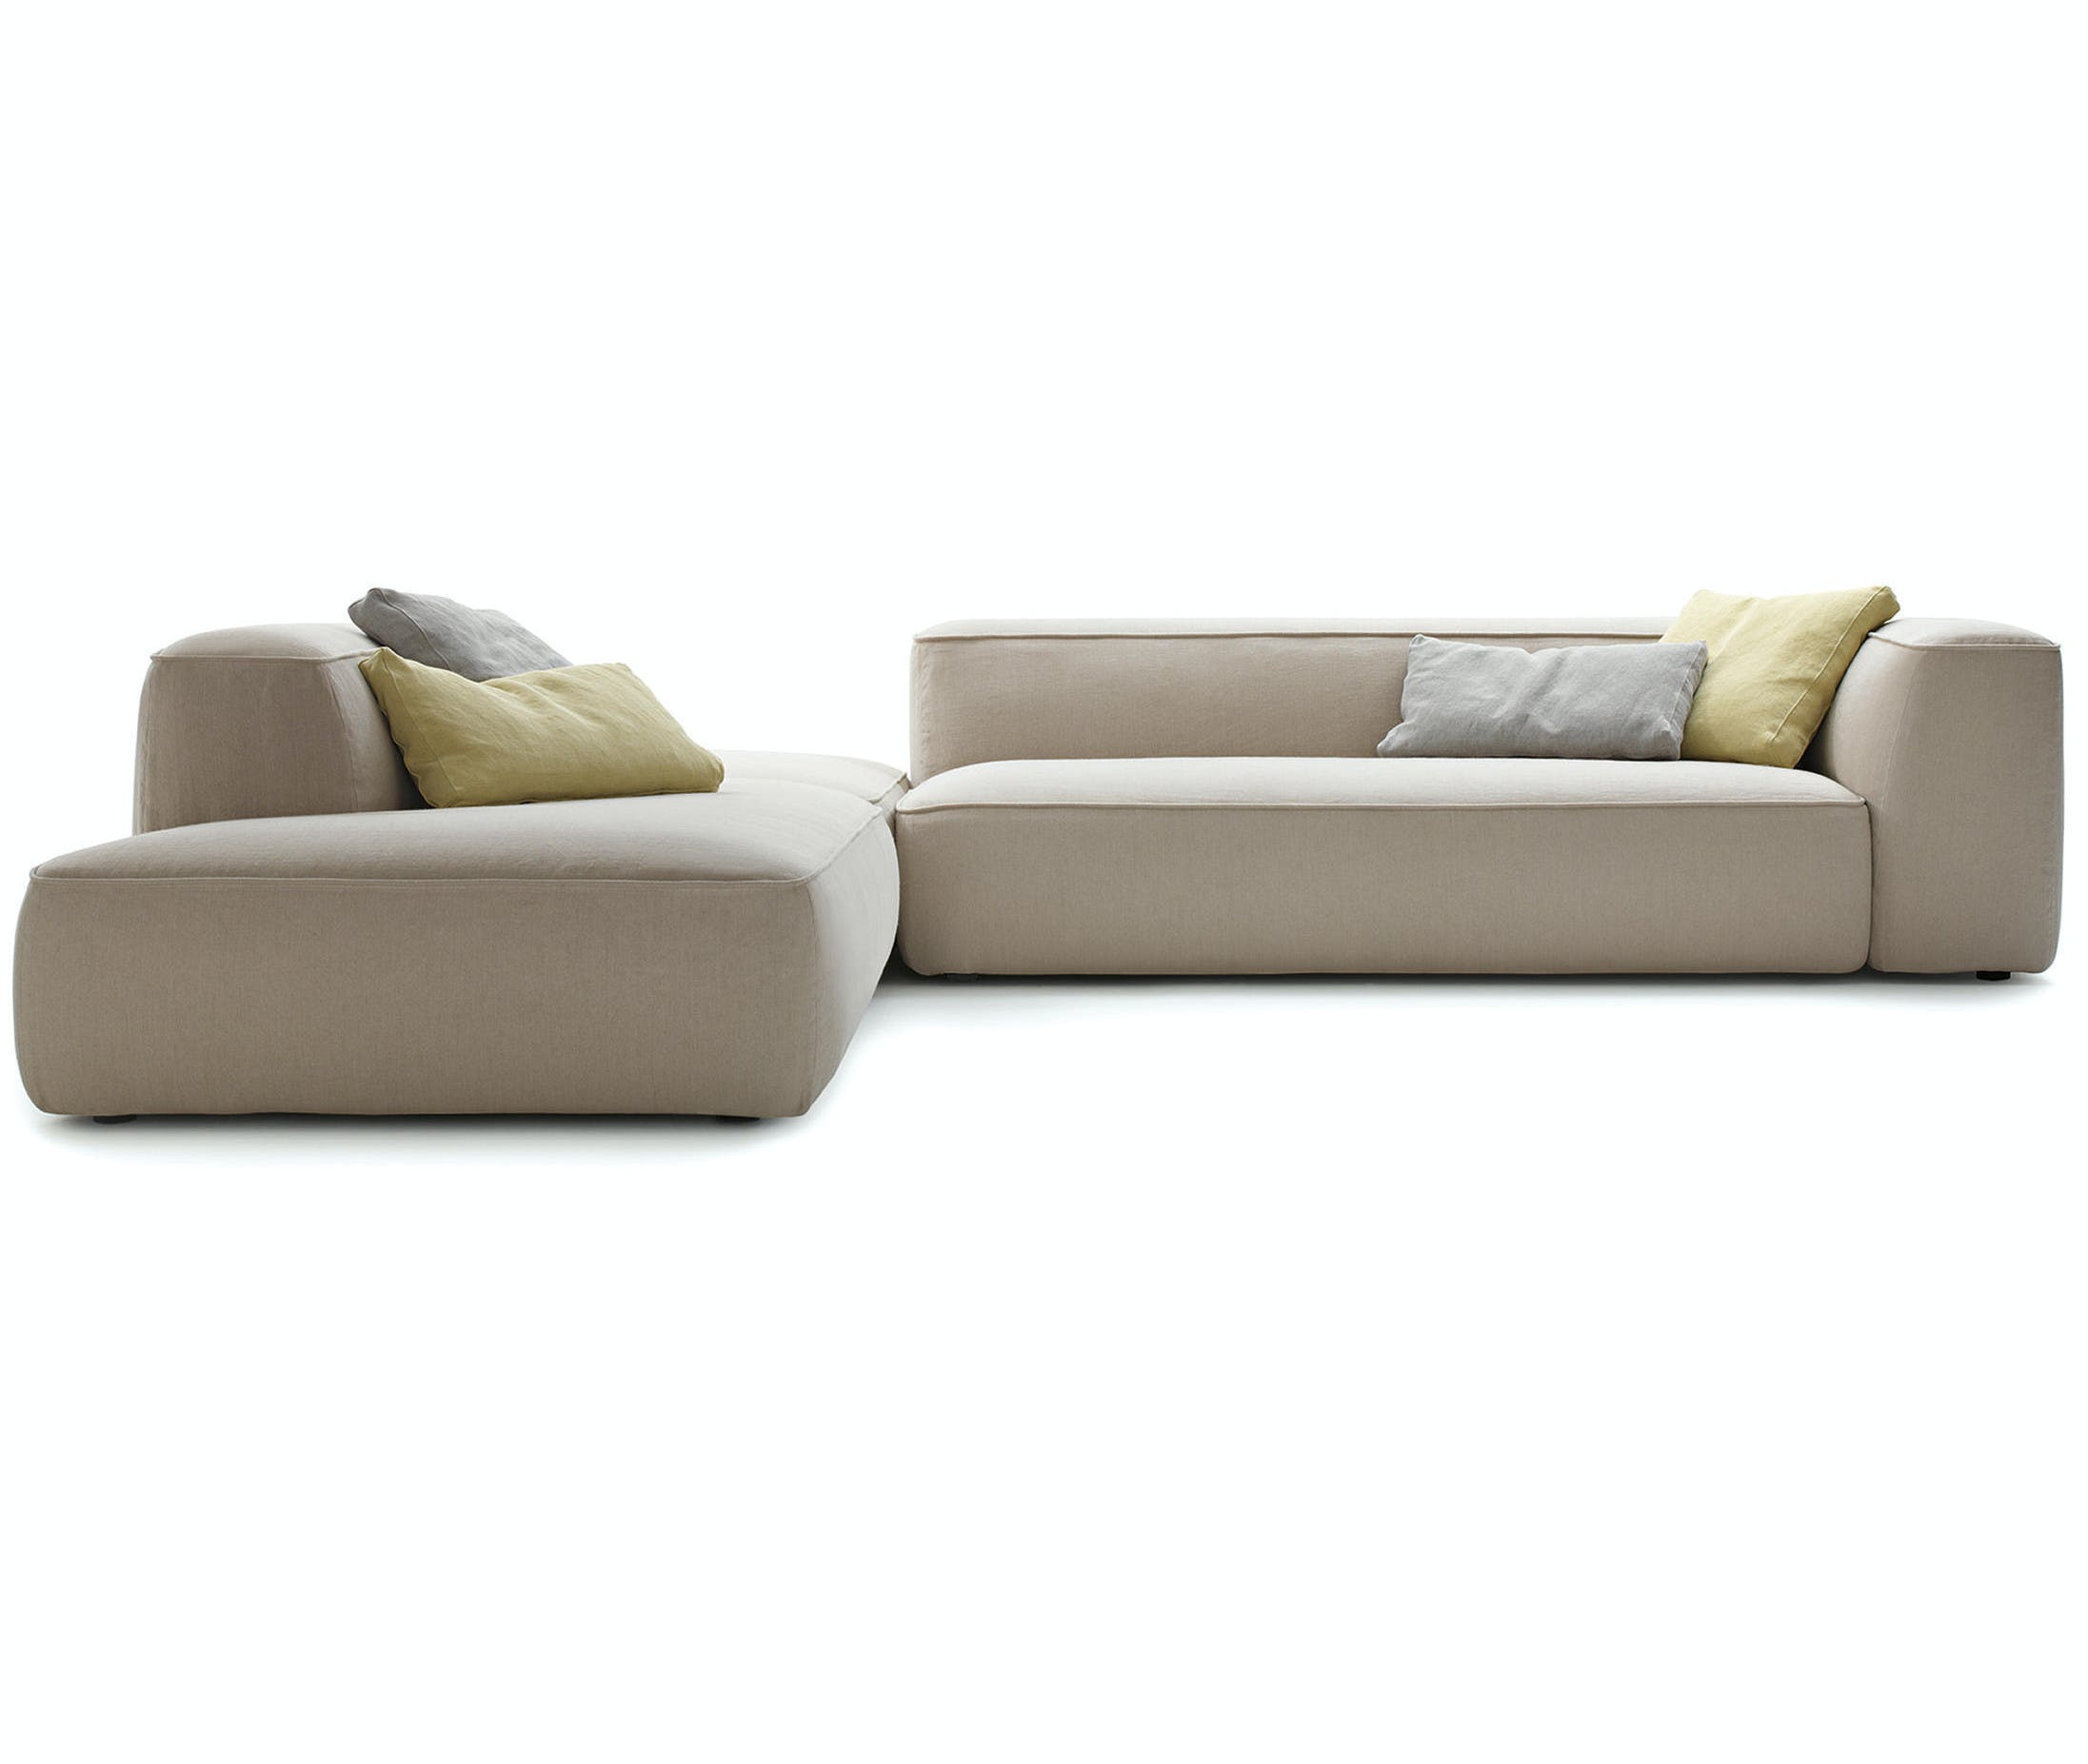 Lema-beige-cloud-sofa-haute-living